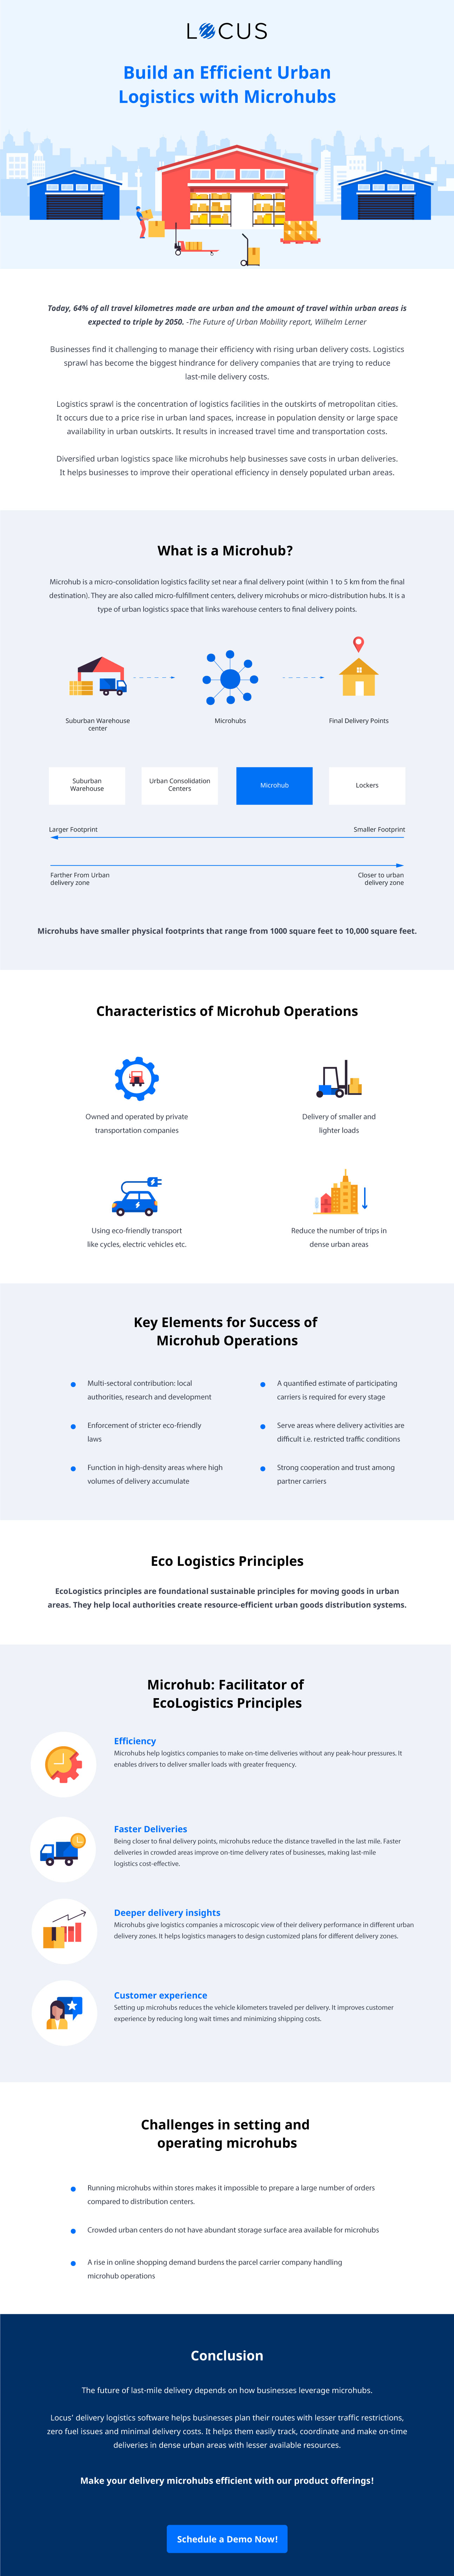 Build an Efficient Urban Logistics with Microhubs